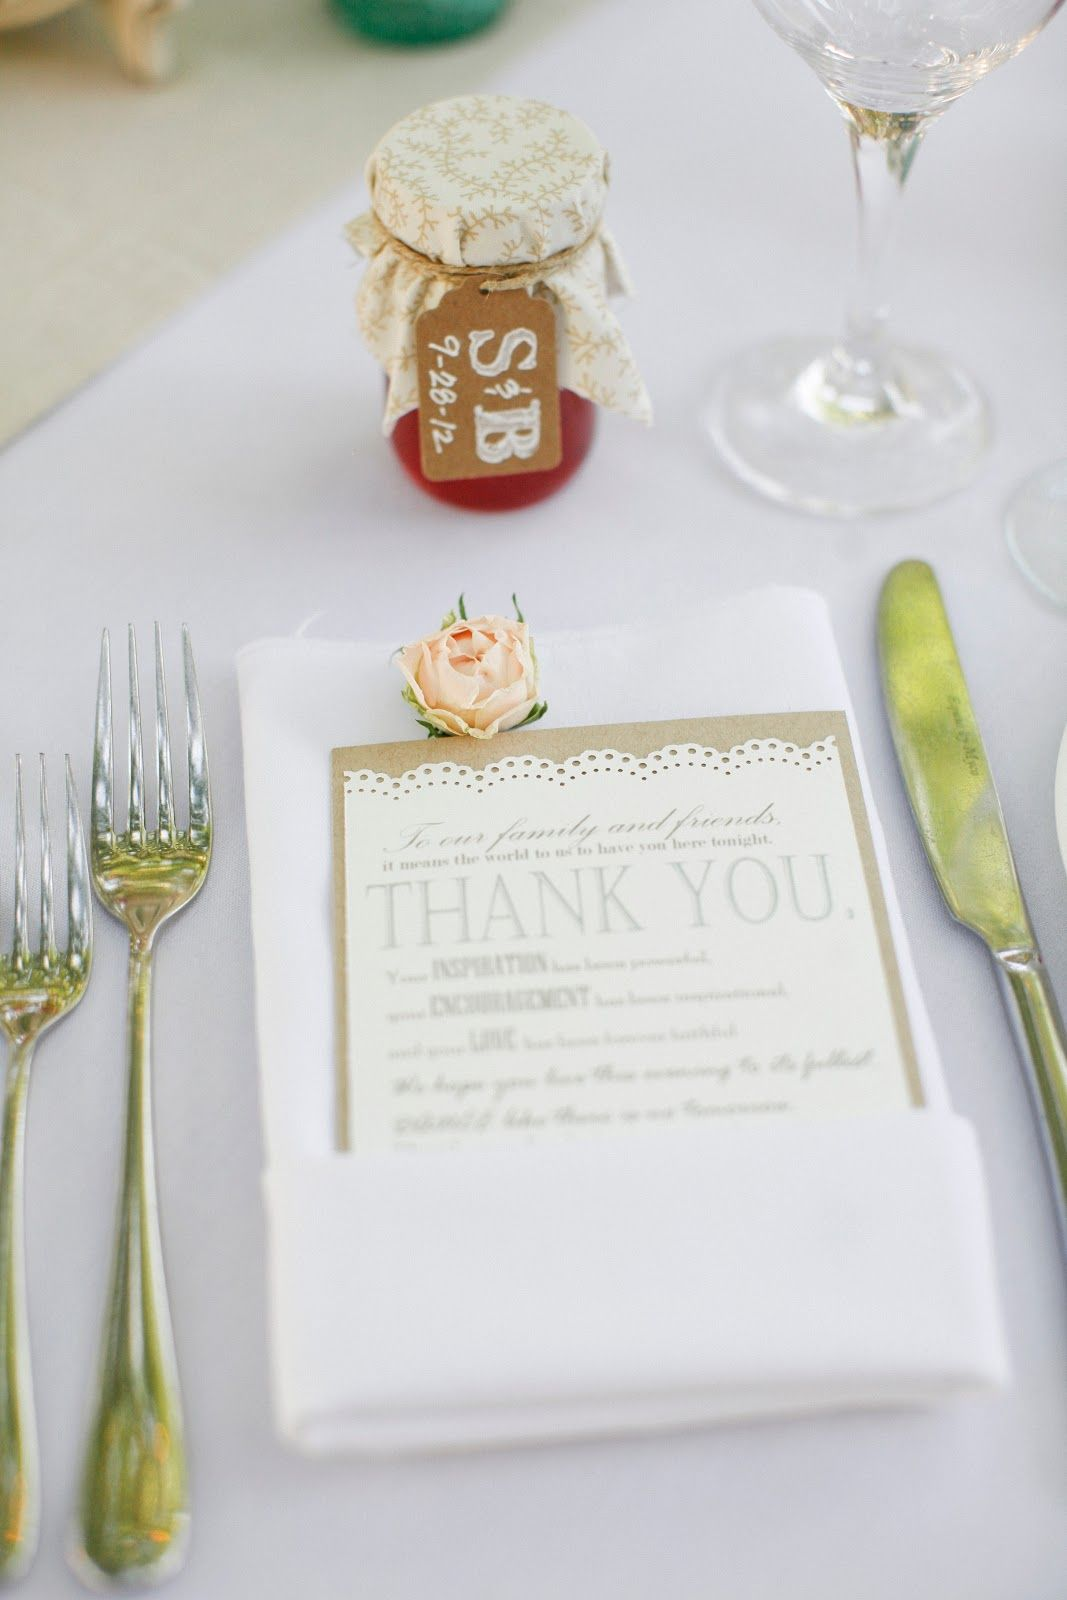 Spreading floral love. | Floral Occasions | Villa SJC Weddings ...